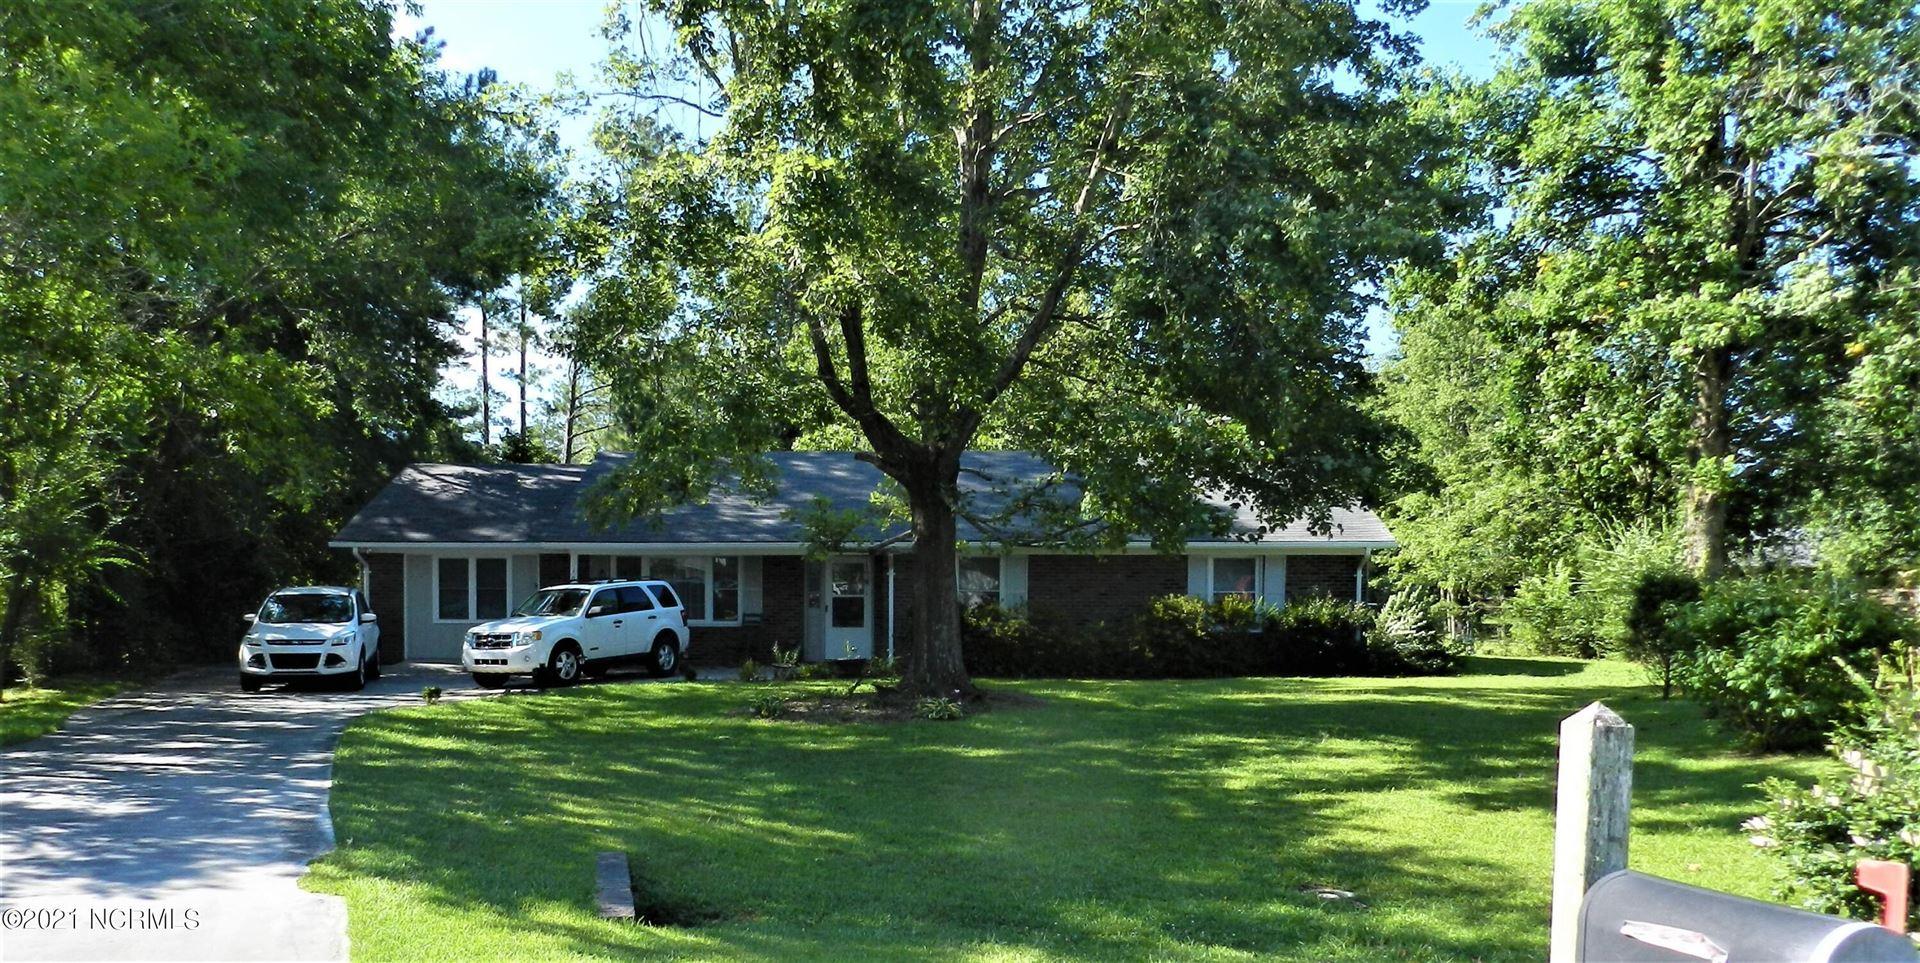 Photo of 104 E Lariat Lane, Havelock, NC 28532 (MLS # 100289912)